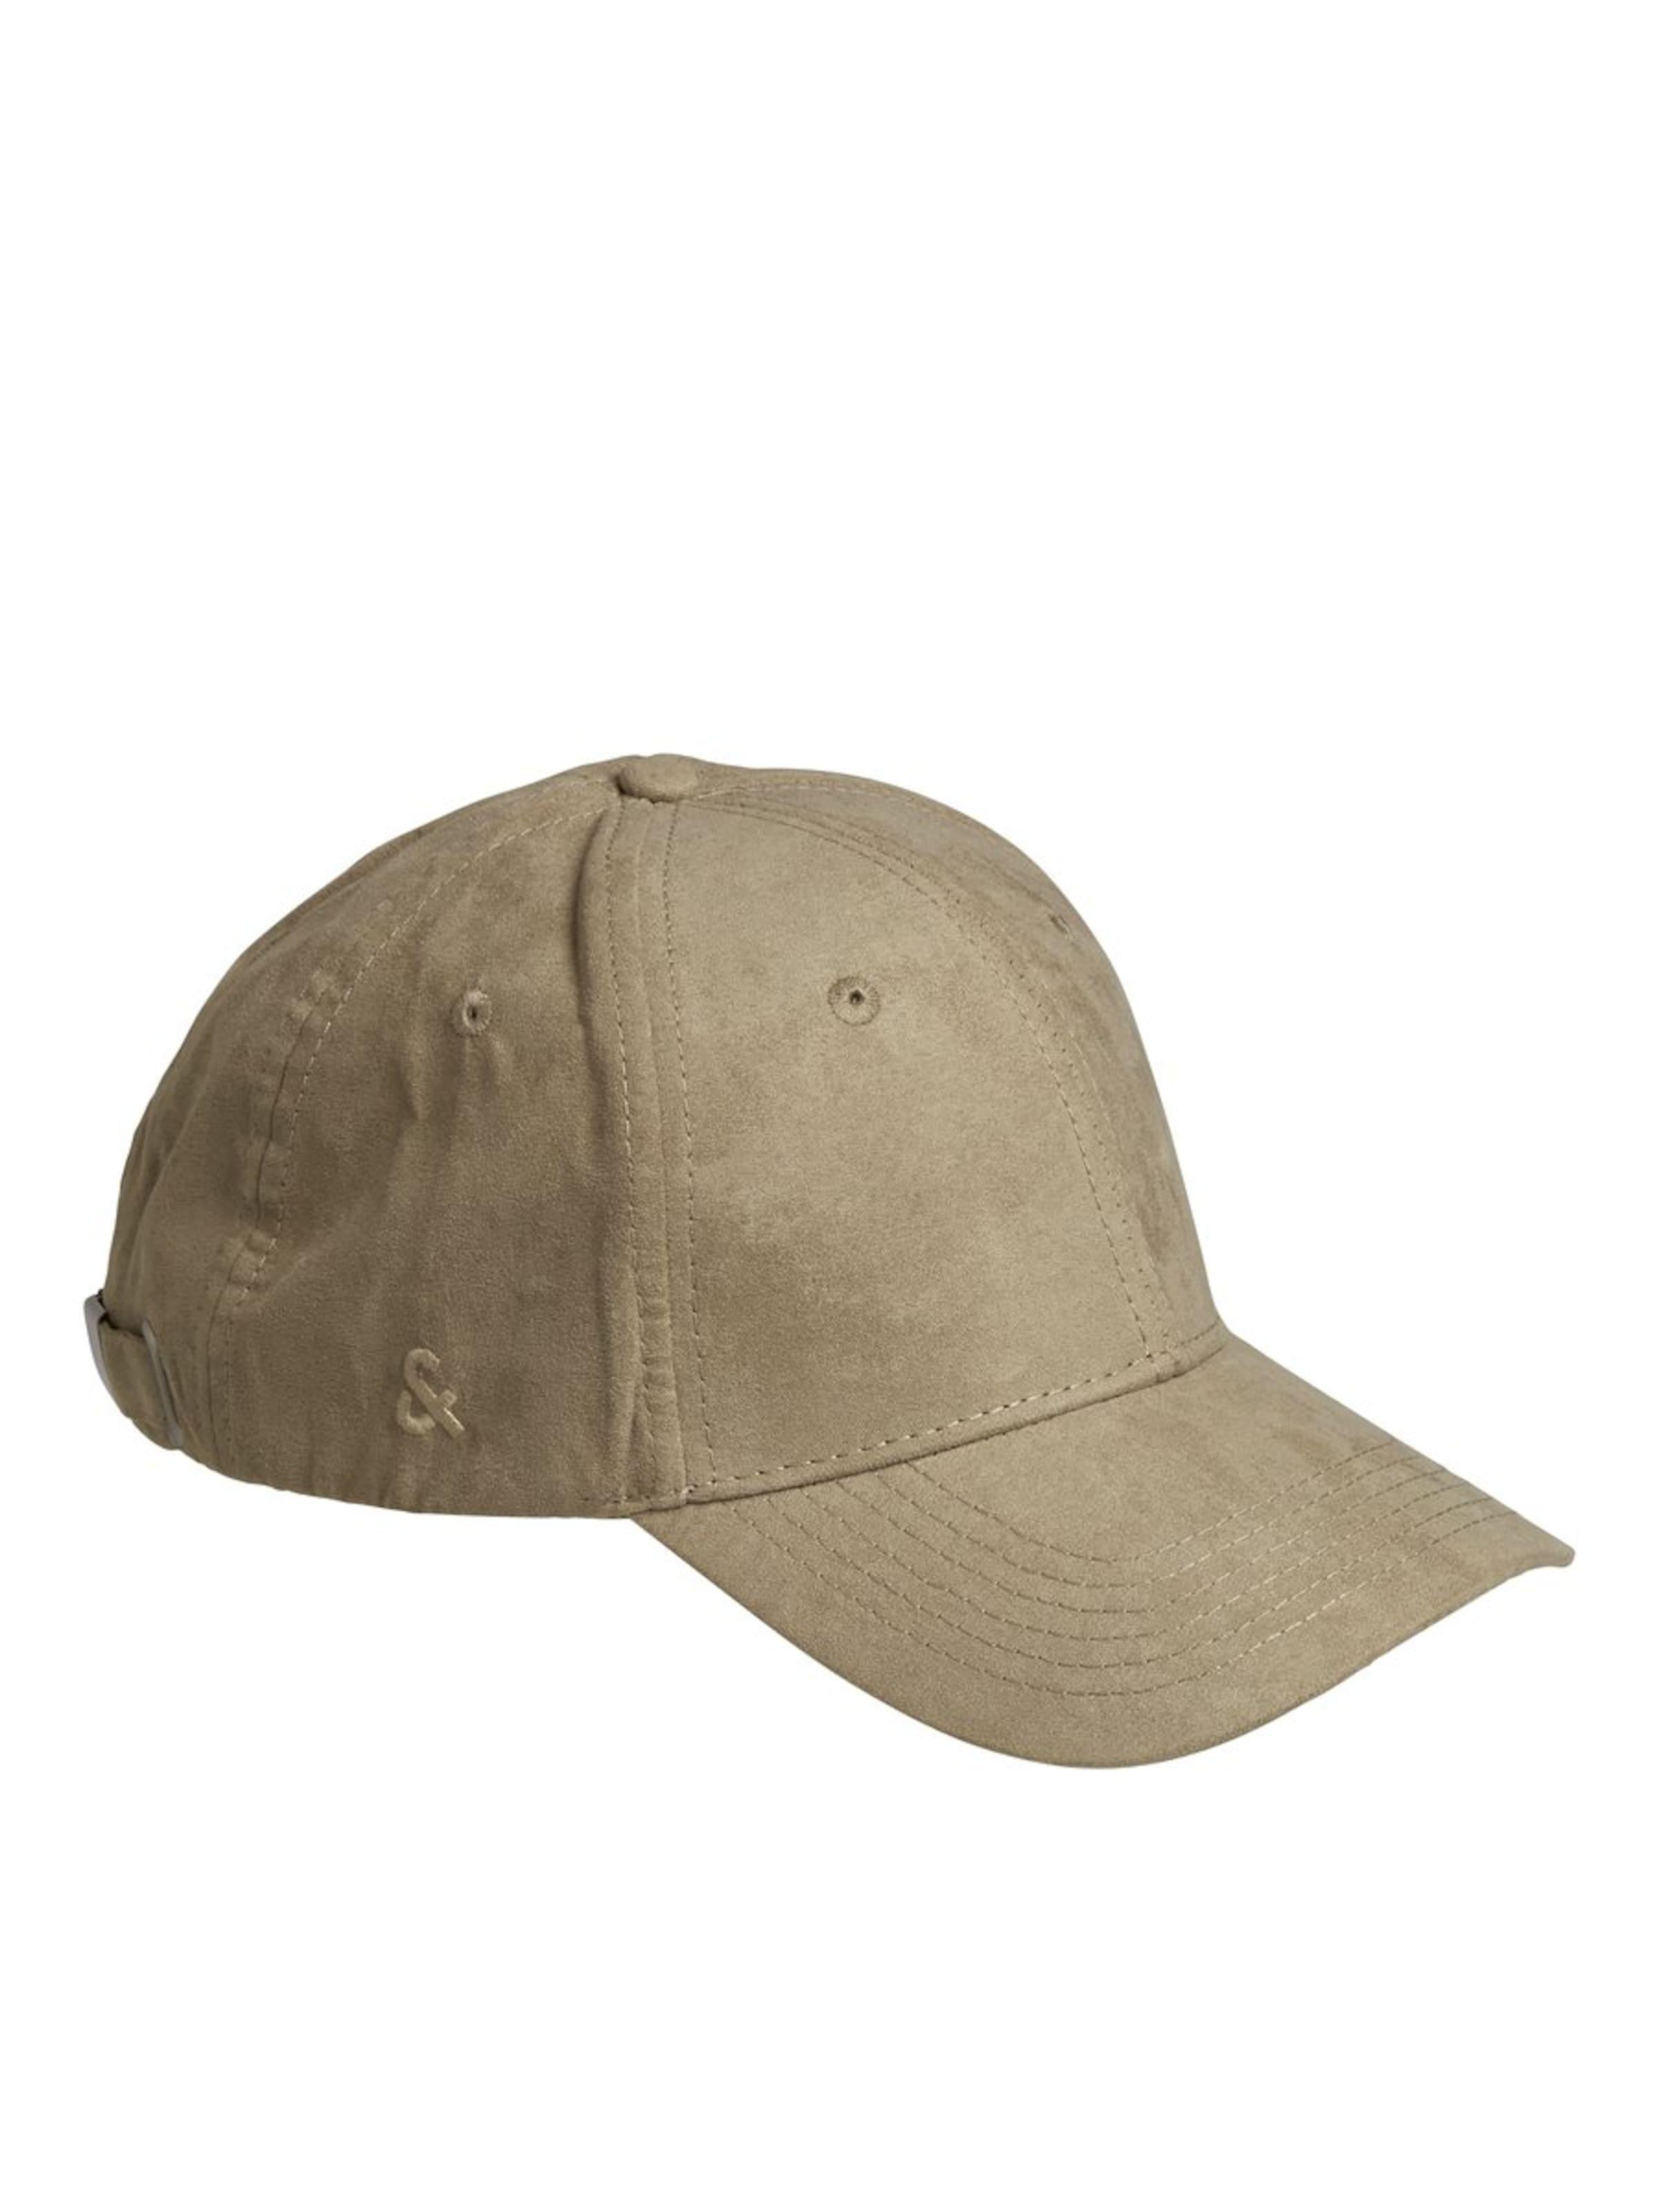 Baseball' Jackamp; Cap In Hellbraun 'tylor Suede Jones O0Nwymnv8